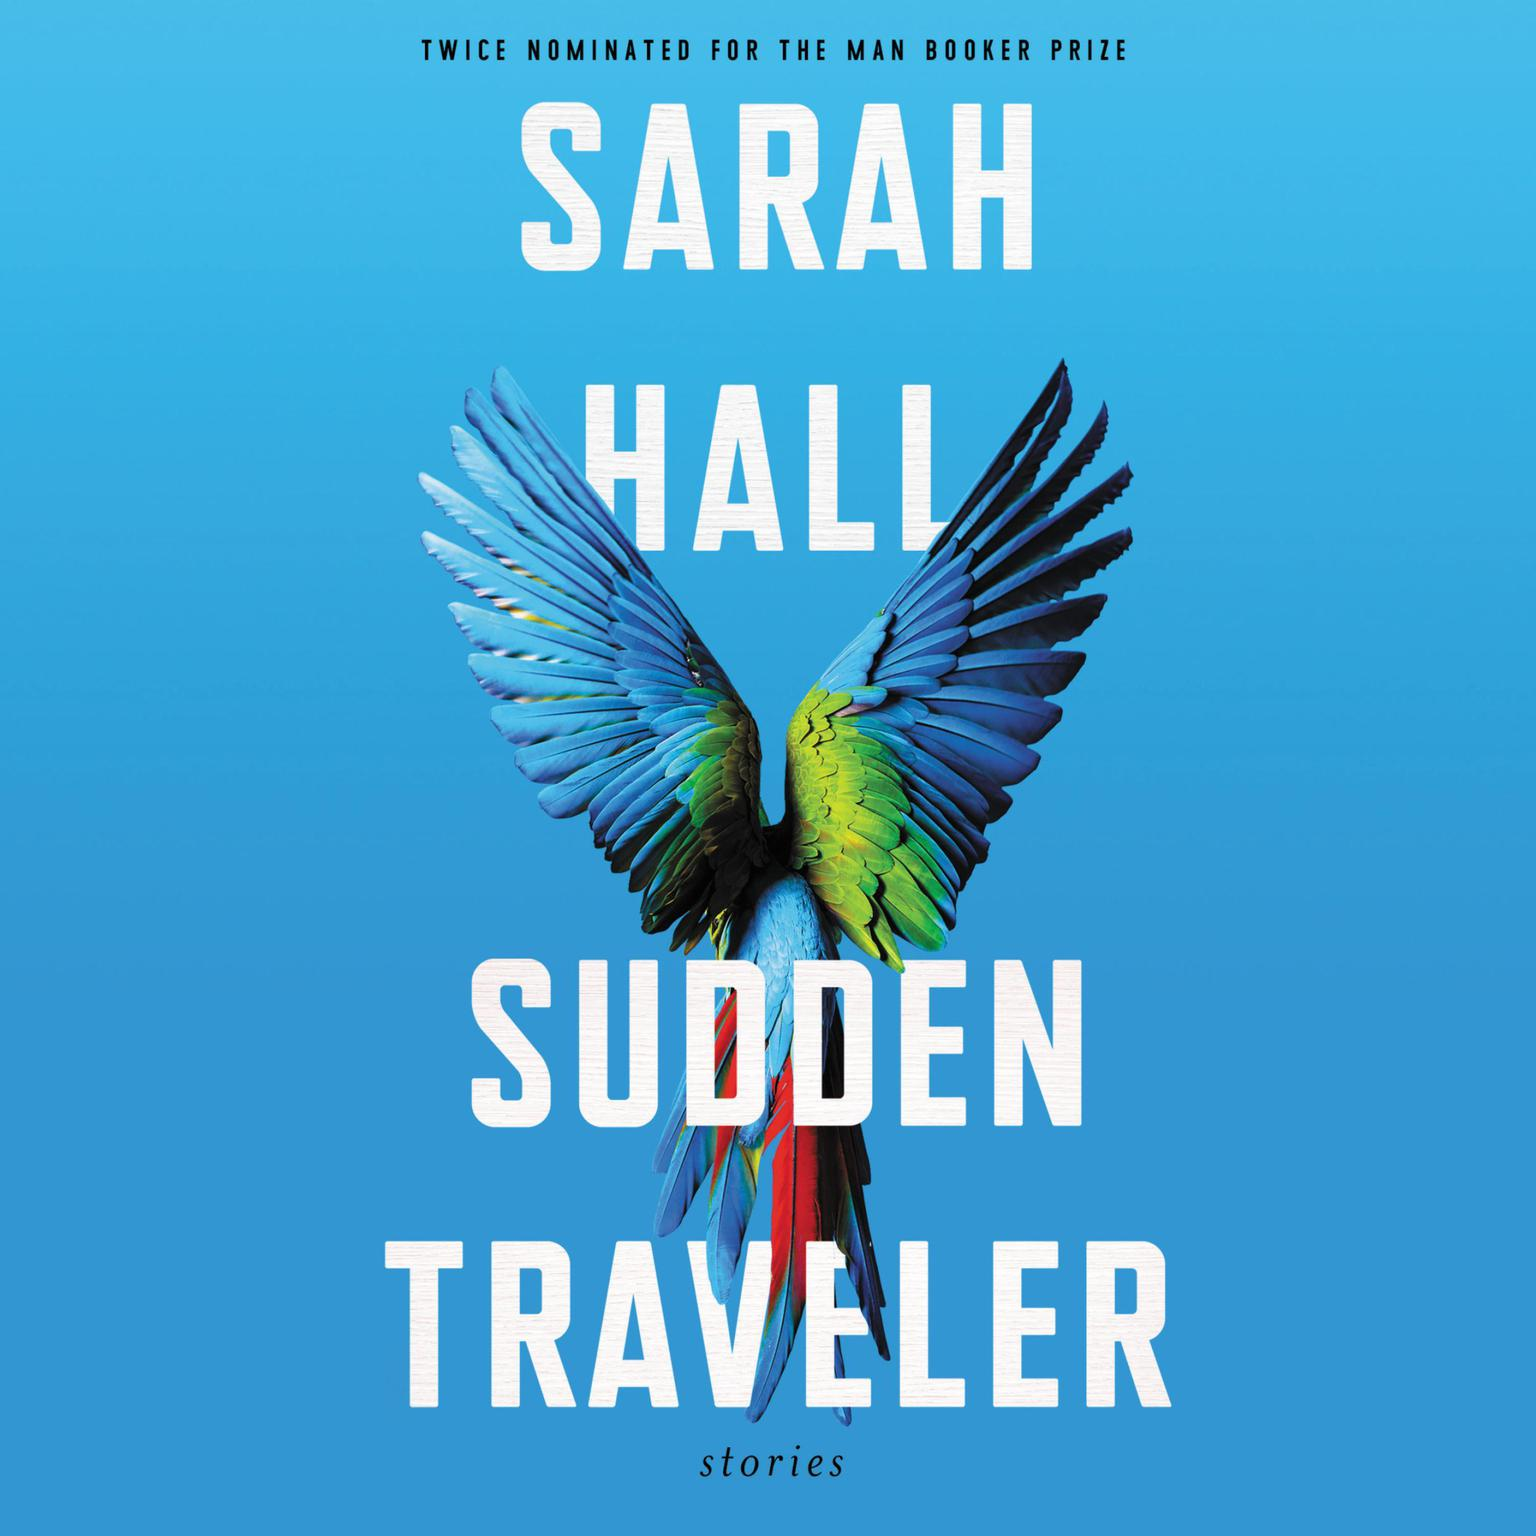 Sudden Traveler: Stories Audiobook, by Sarah Hall